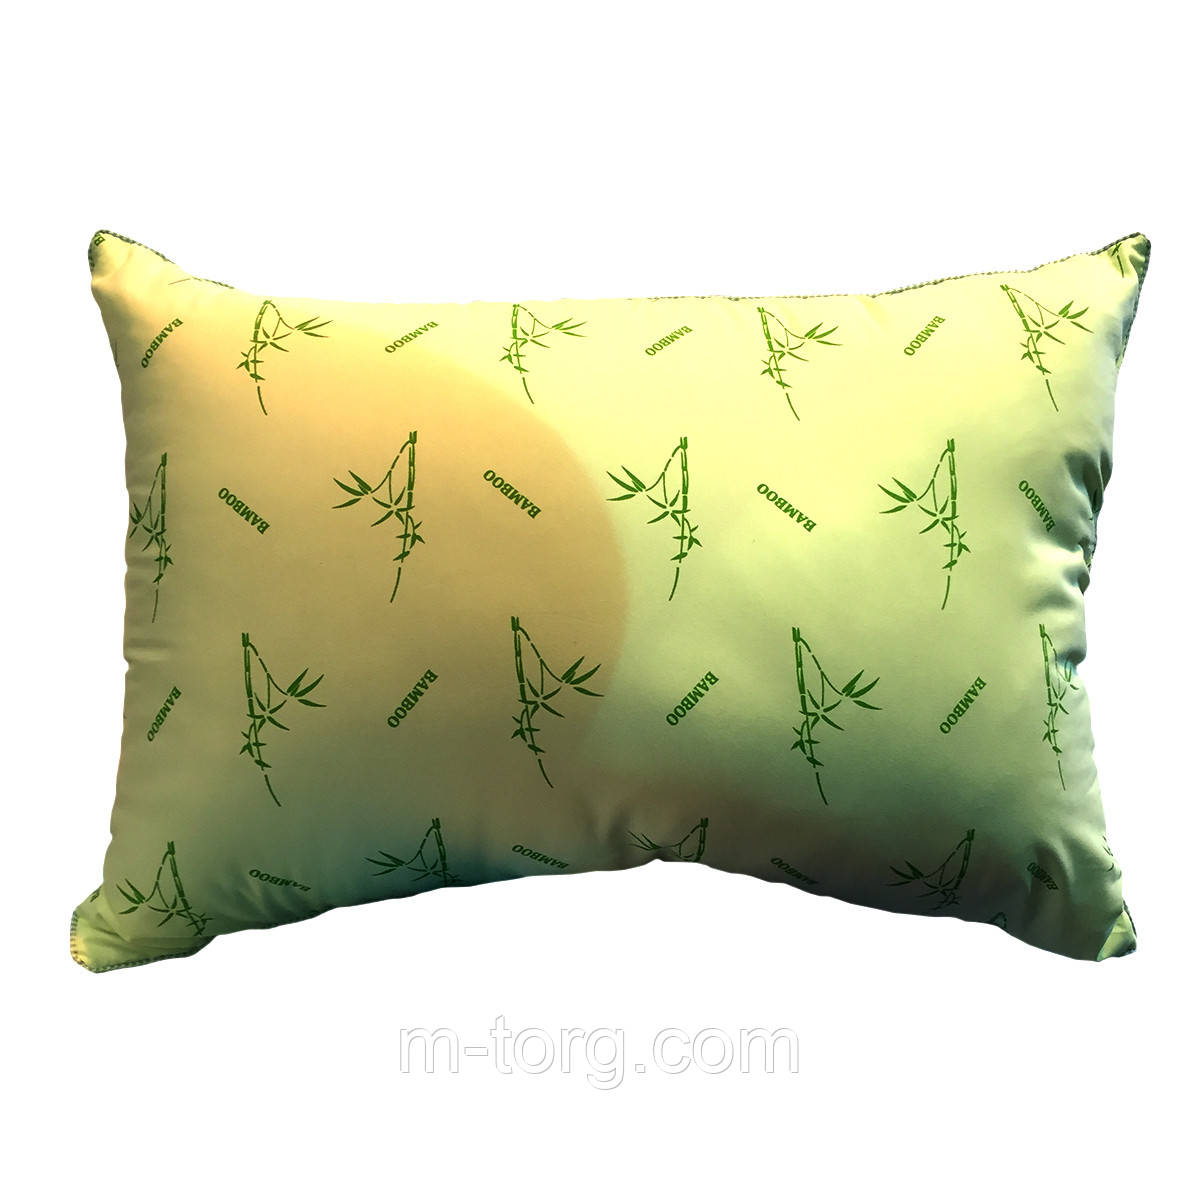 Подушка 50/70 см,бамбук,ткань микрофибра